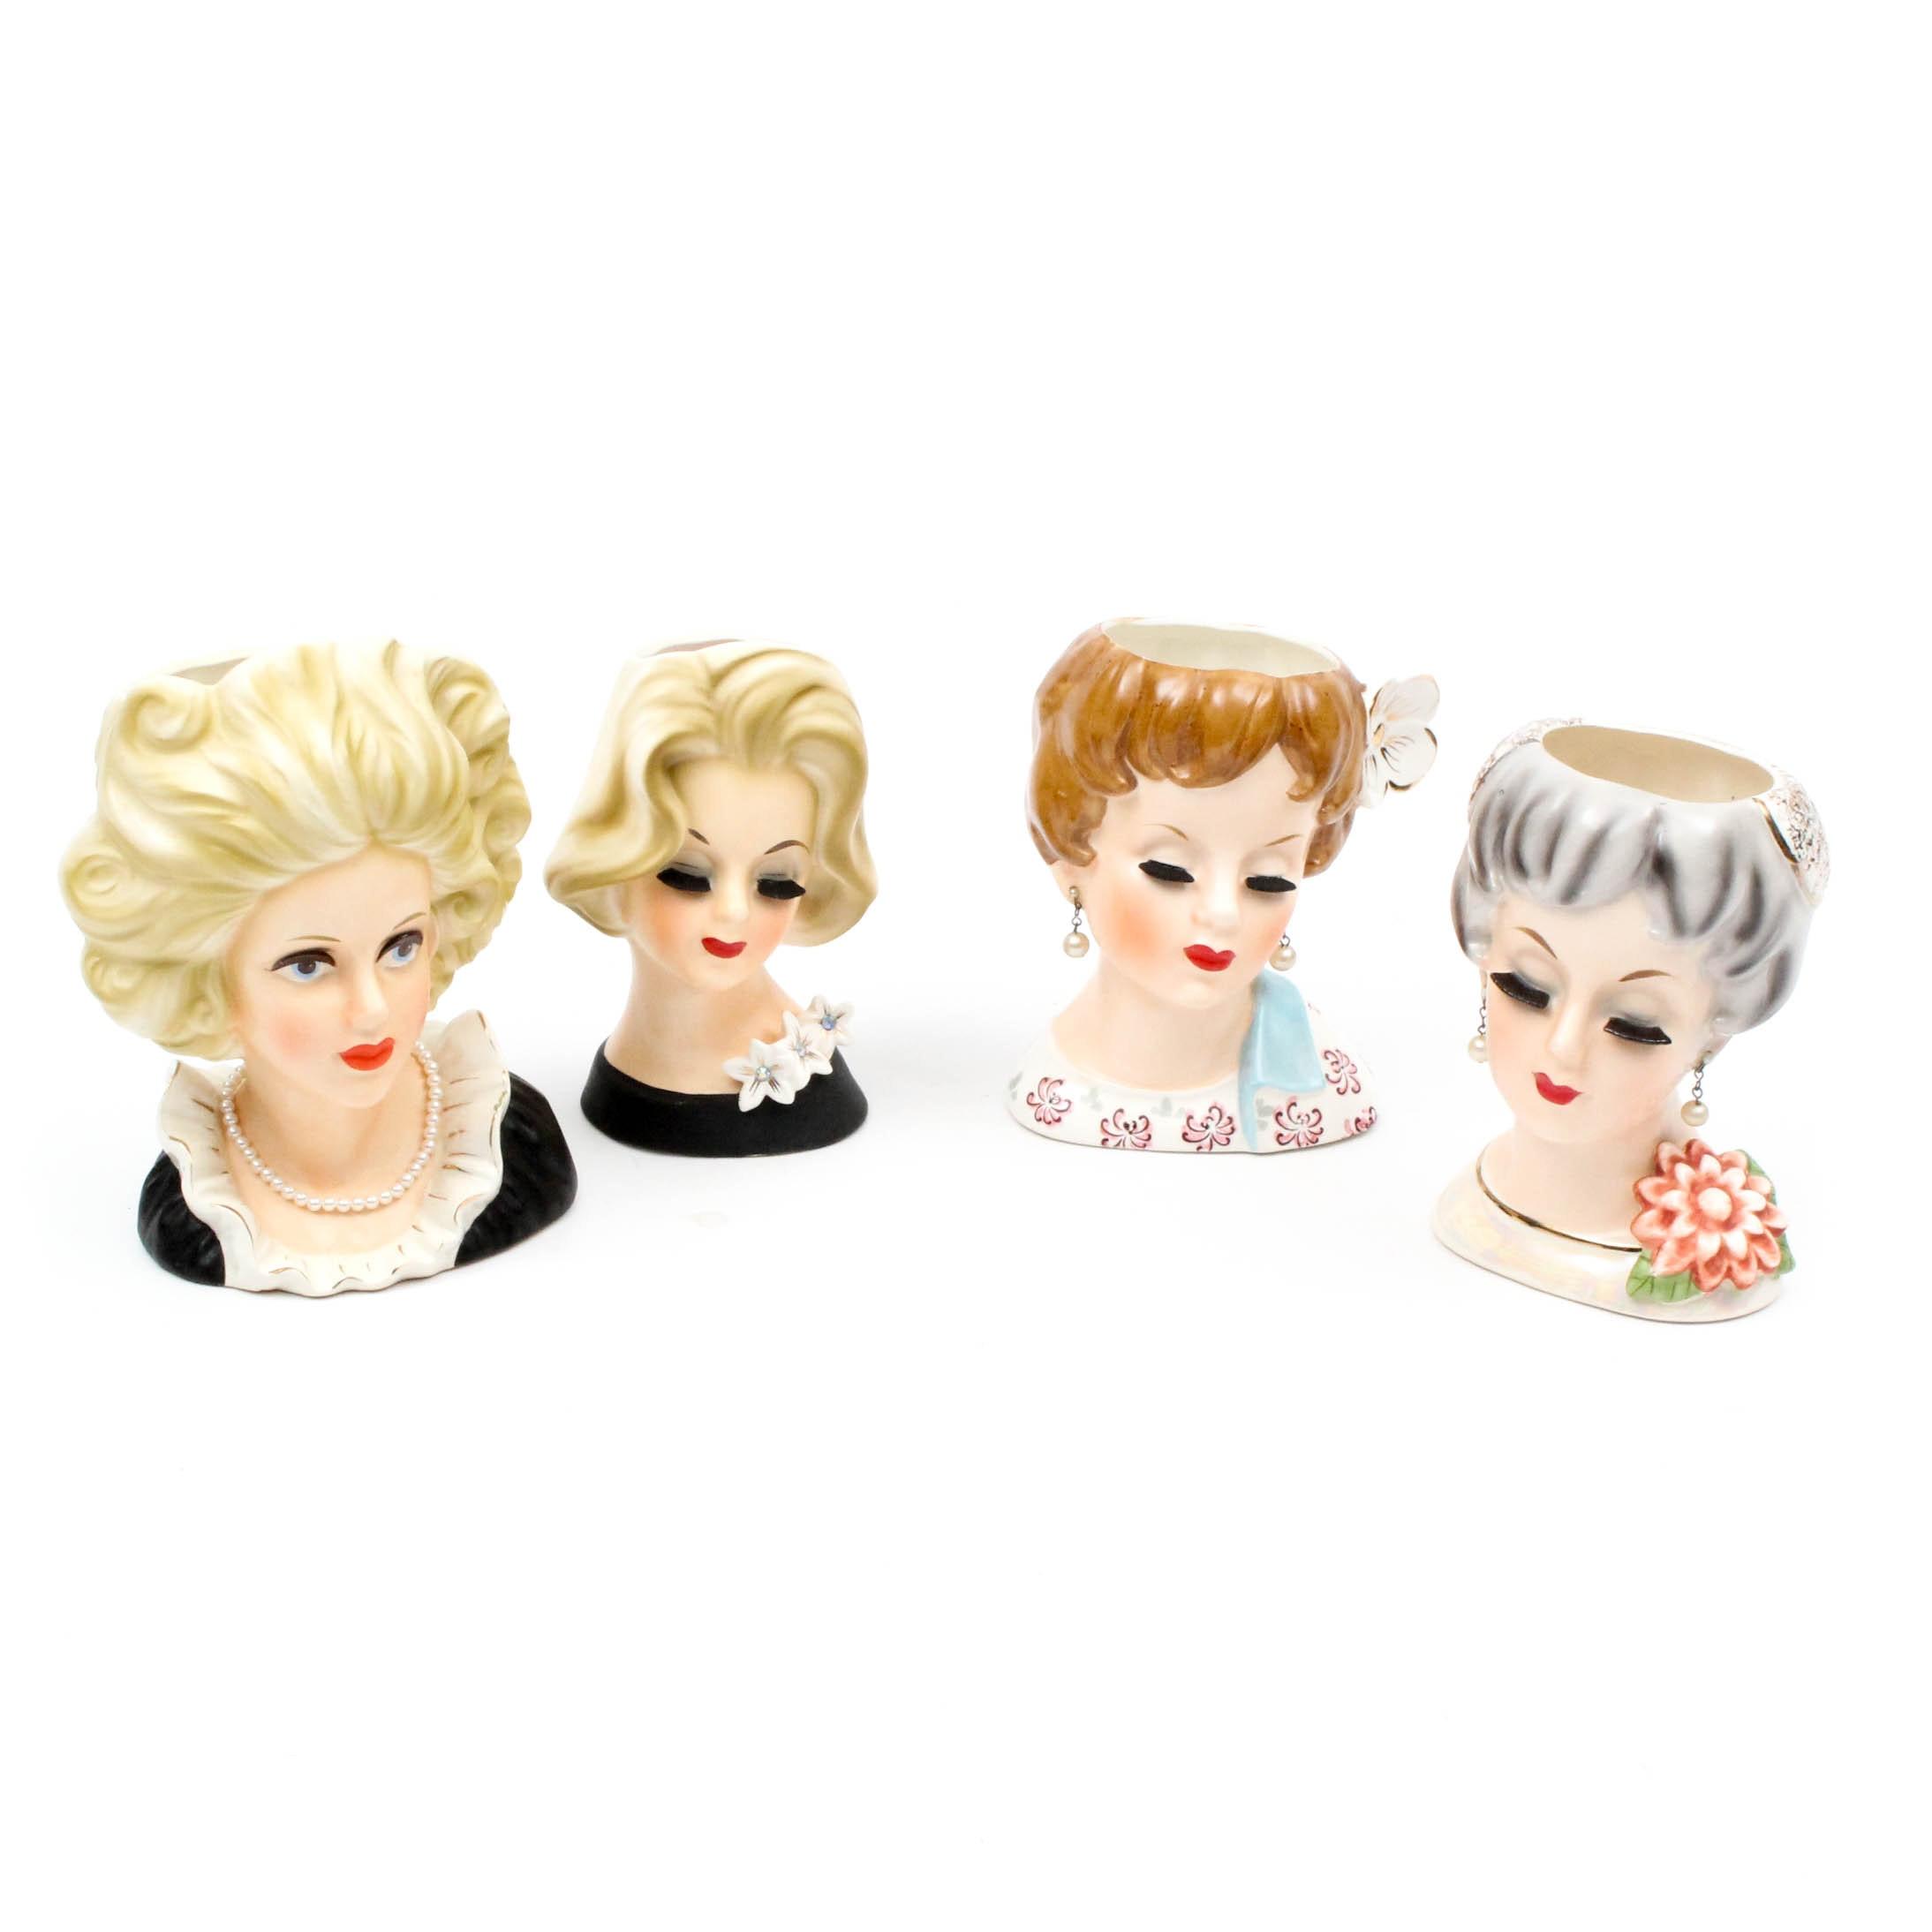 Vintage Lady Head Vases Including Relpo